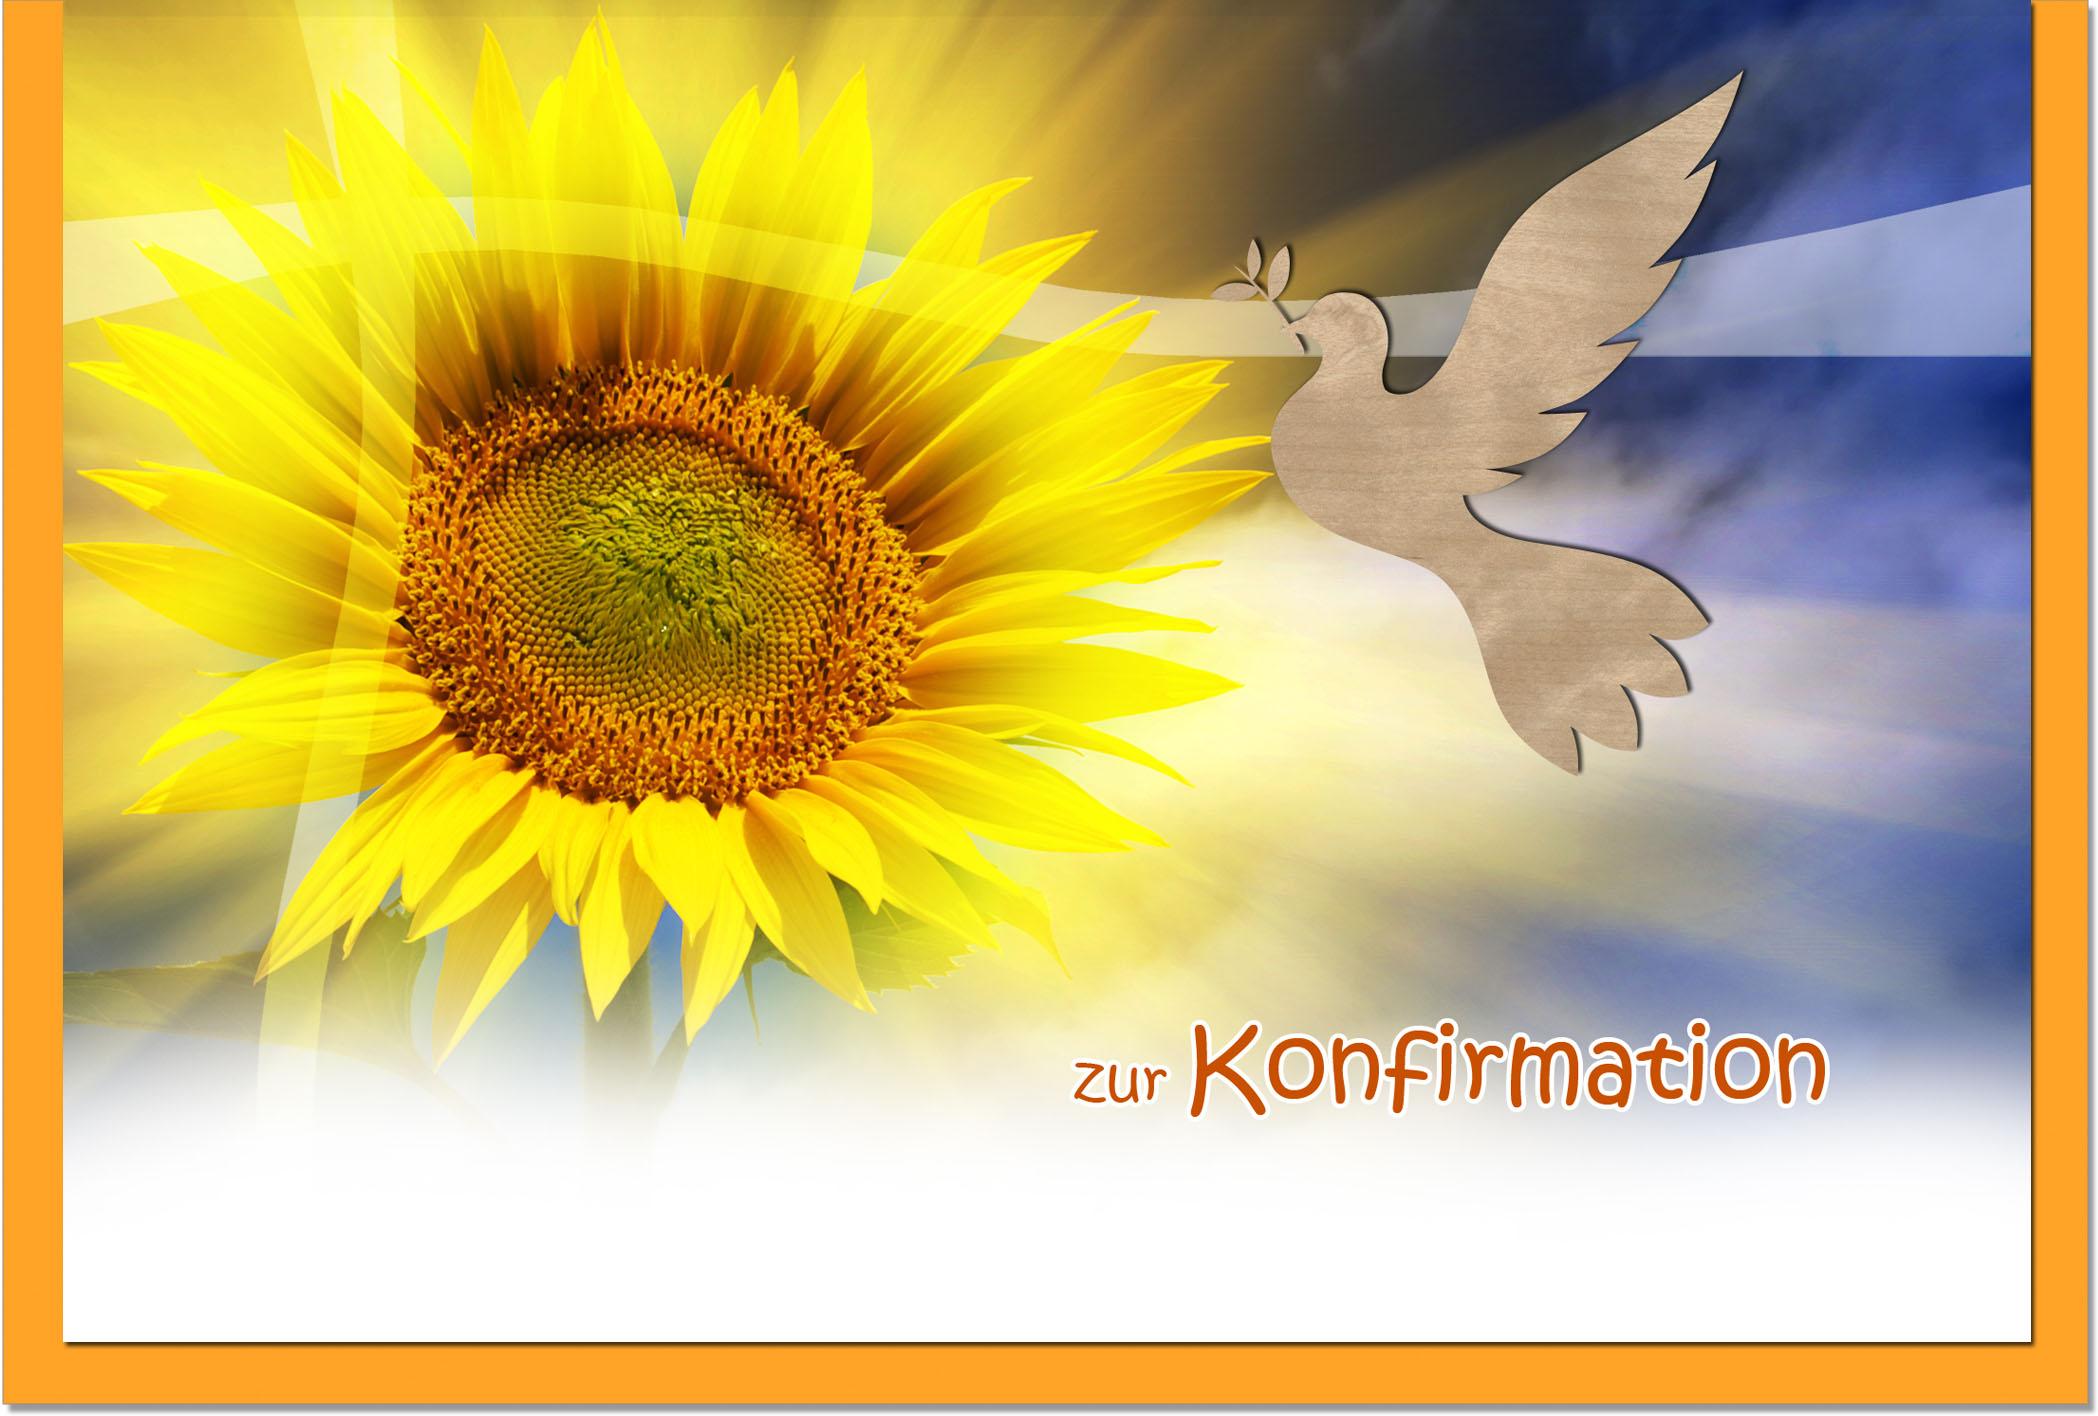 Konfirmationskarten / Grußkarten / Glückwunschkarten /Konfirmation Sonnenblume